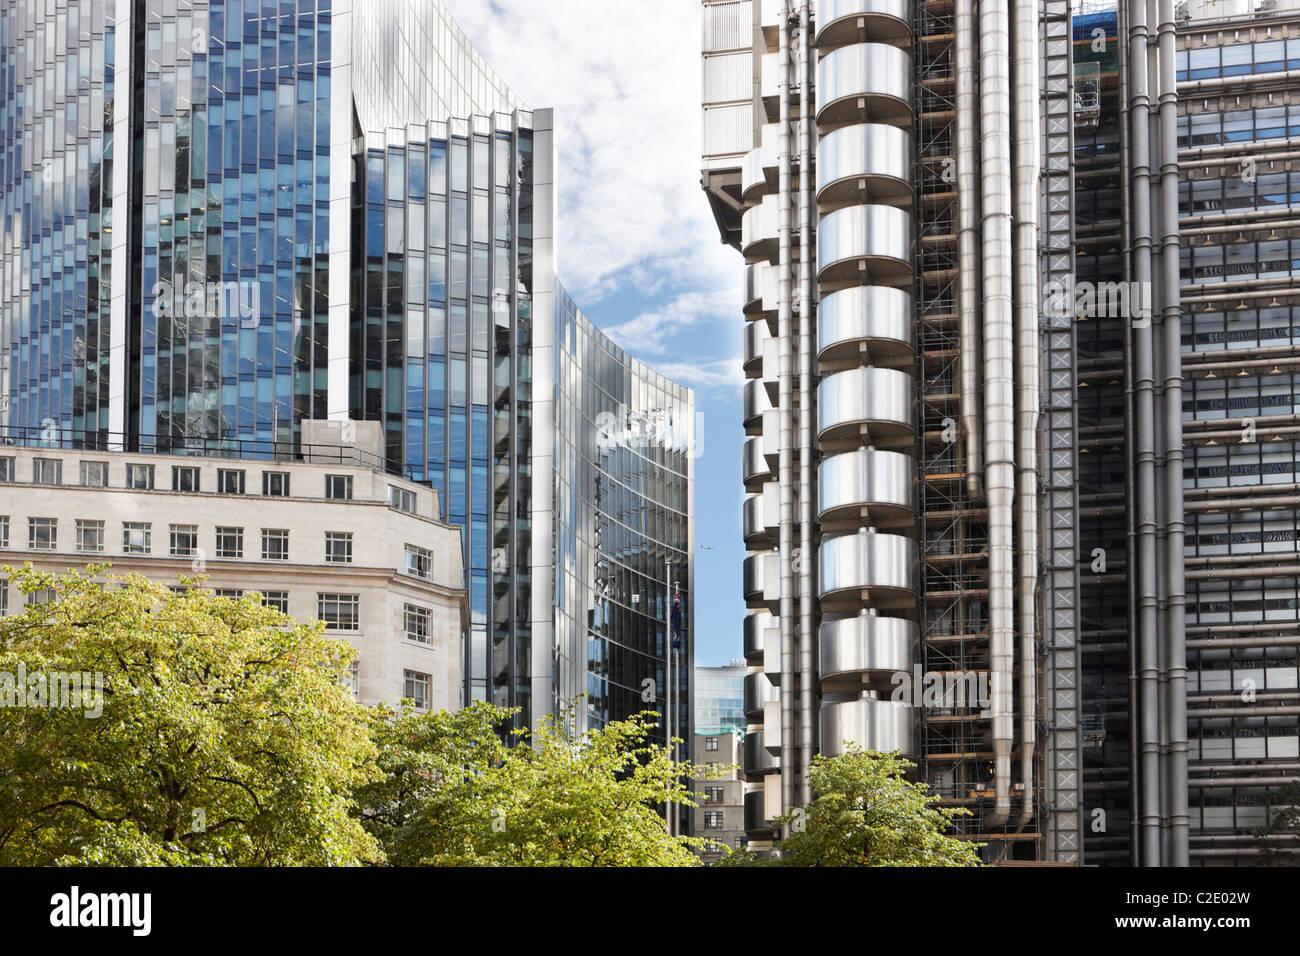 City of London buildings Lloyds building - Stock Image